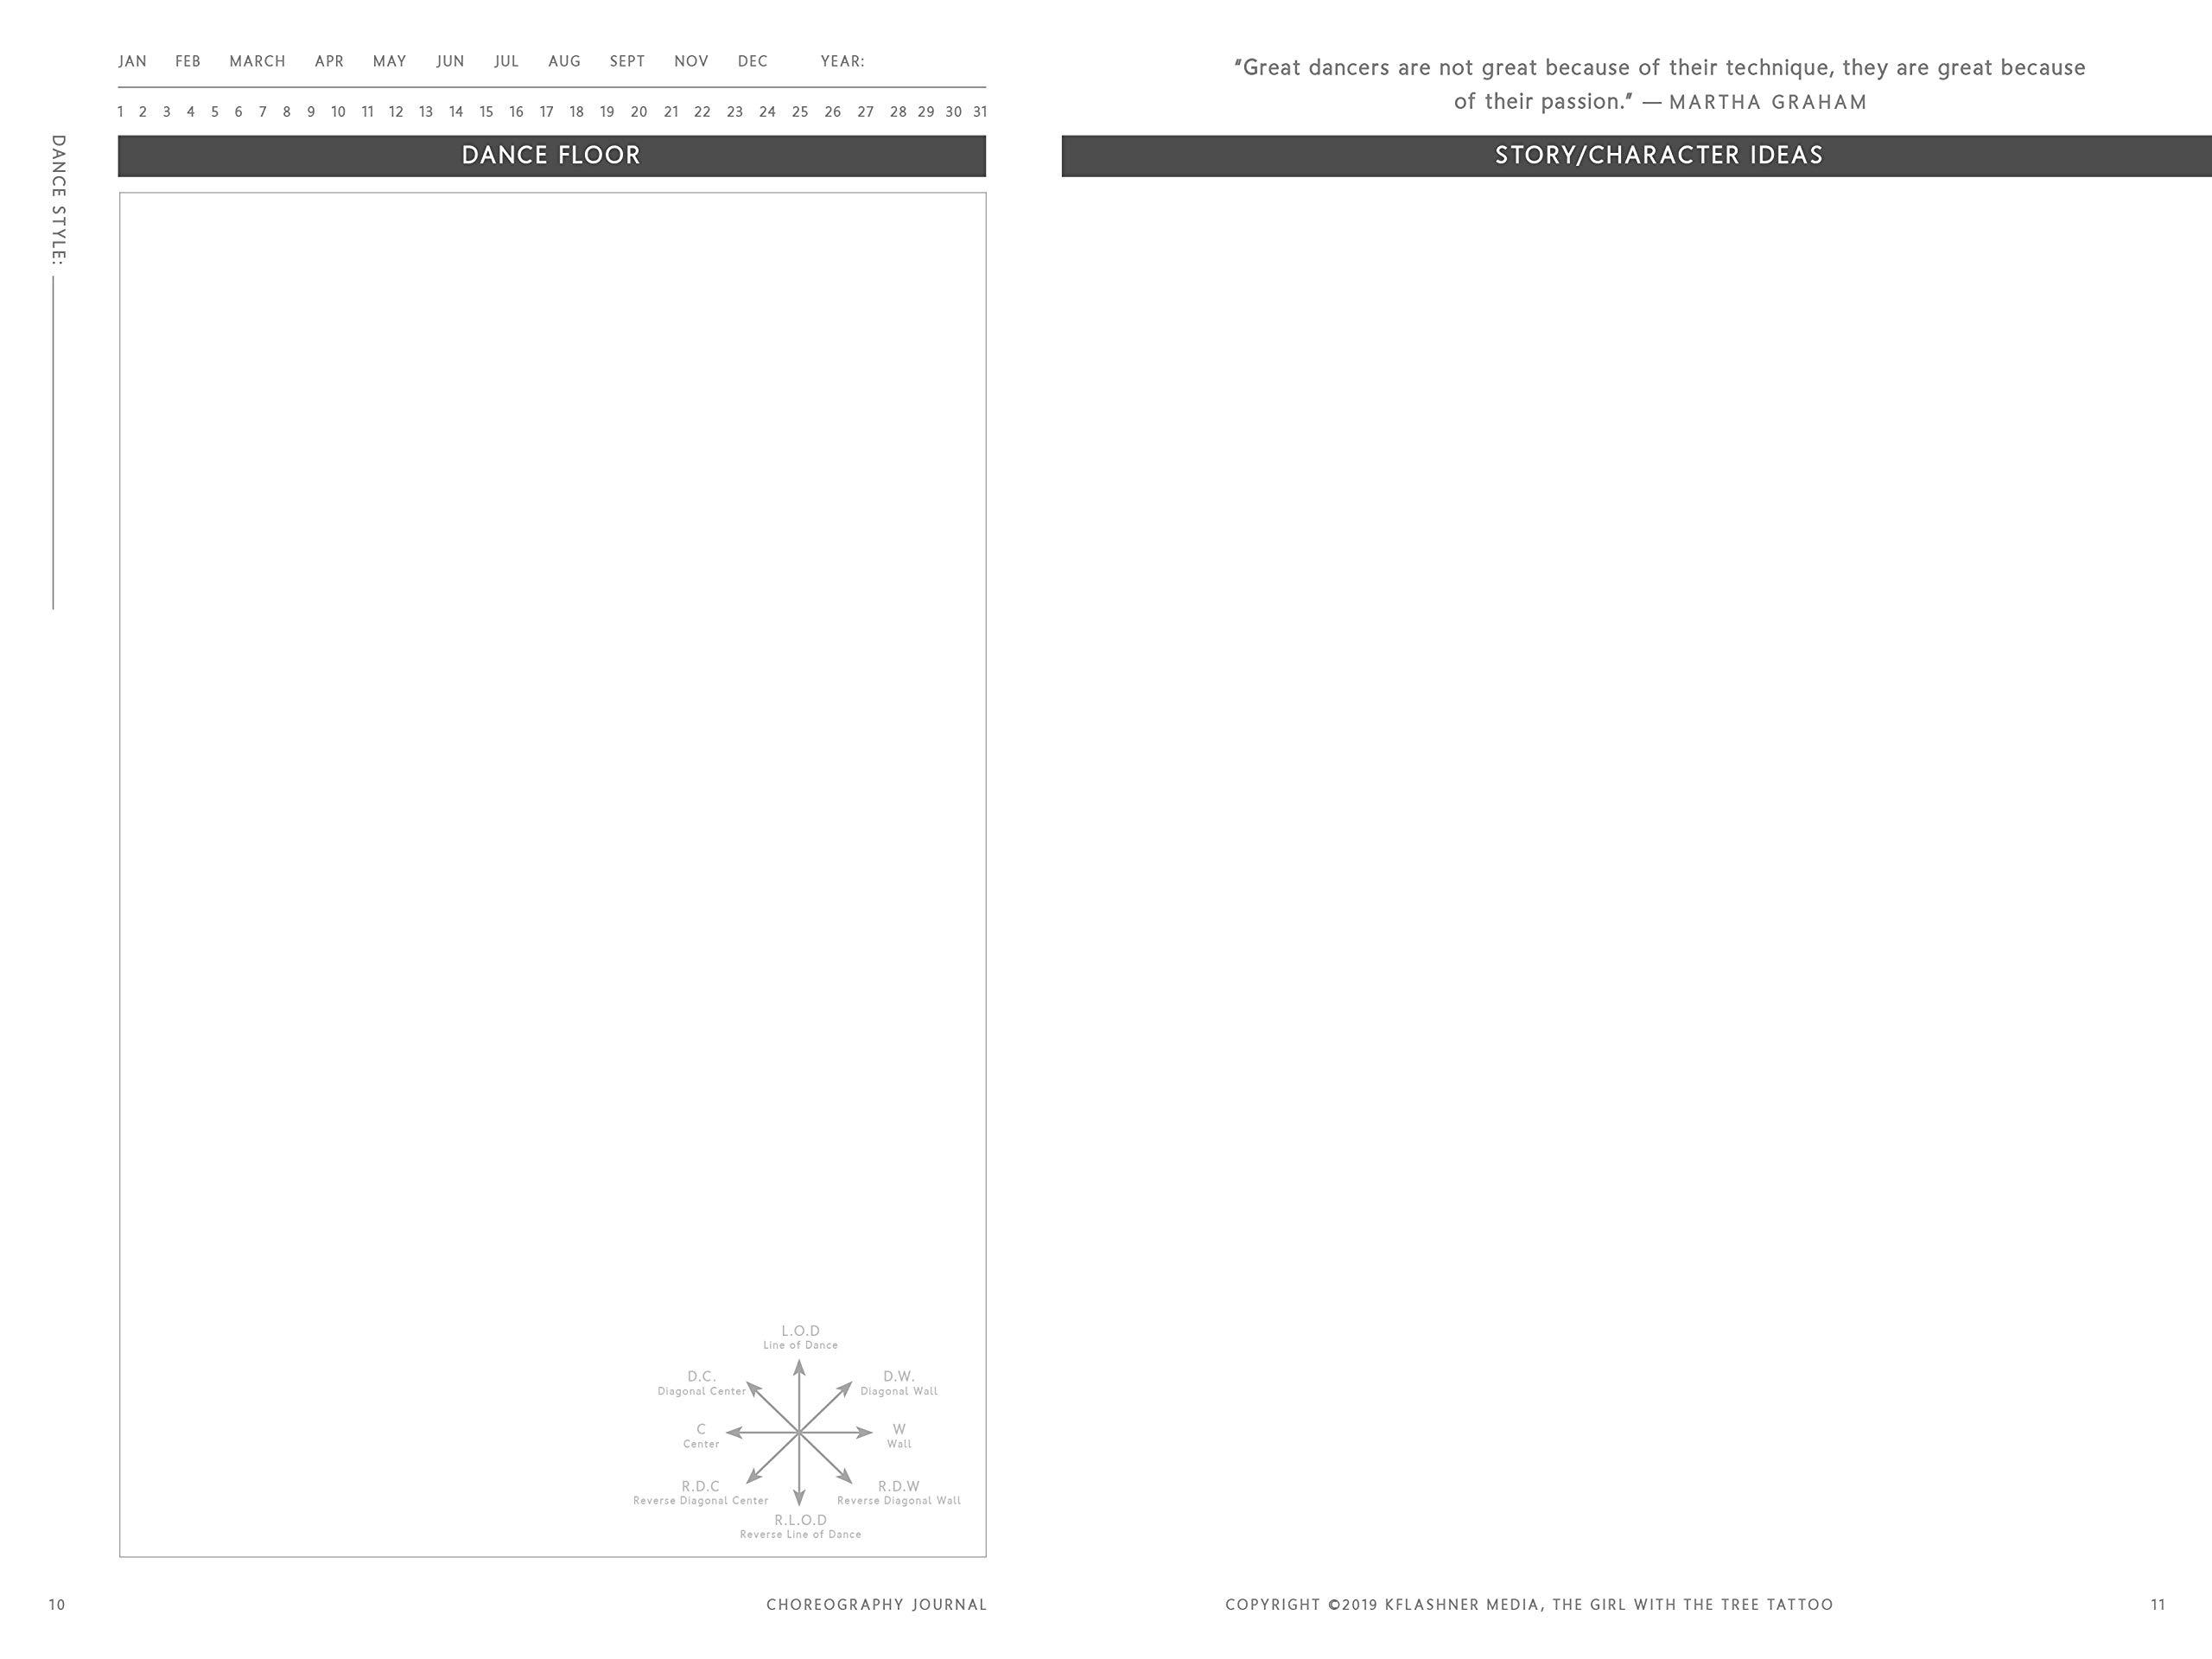 Choreography Journal Interior